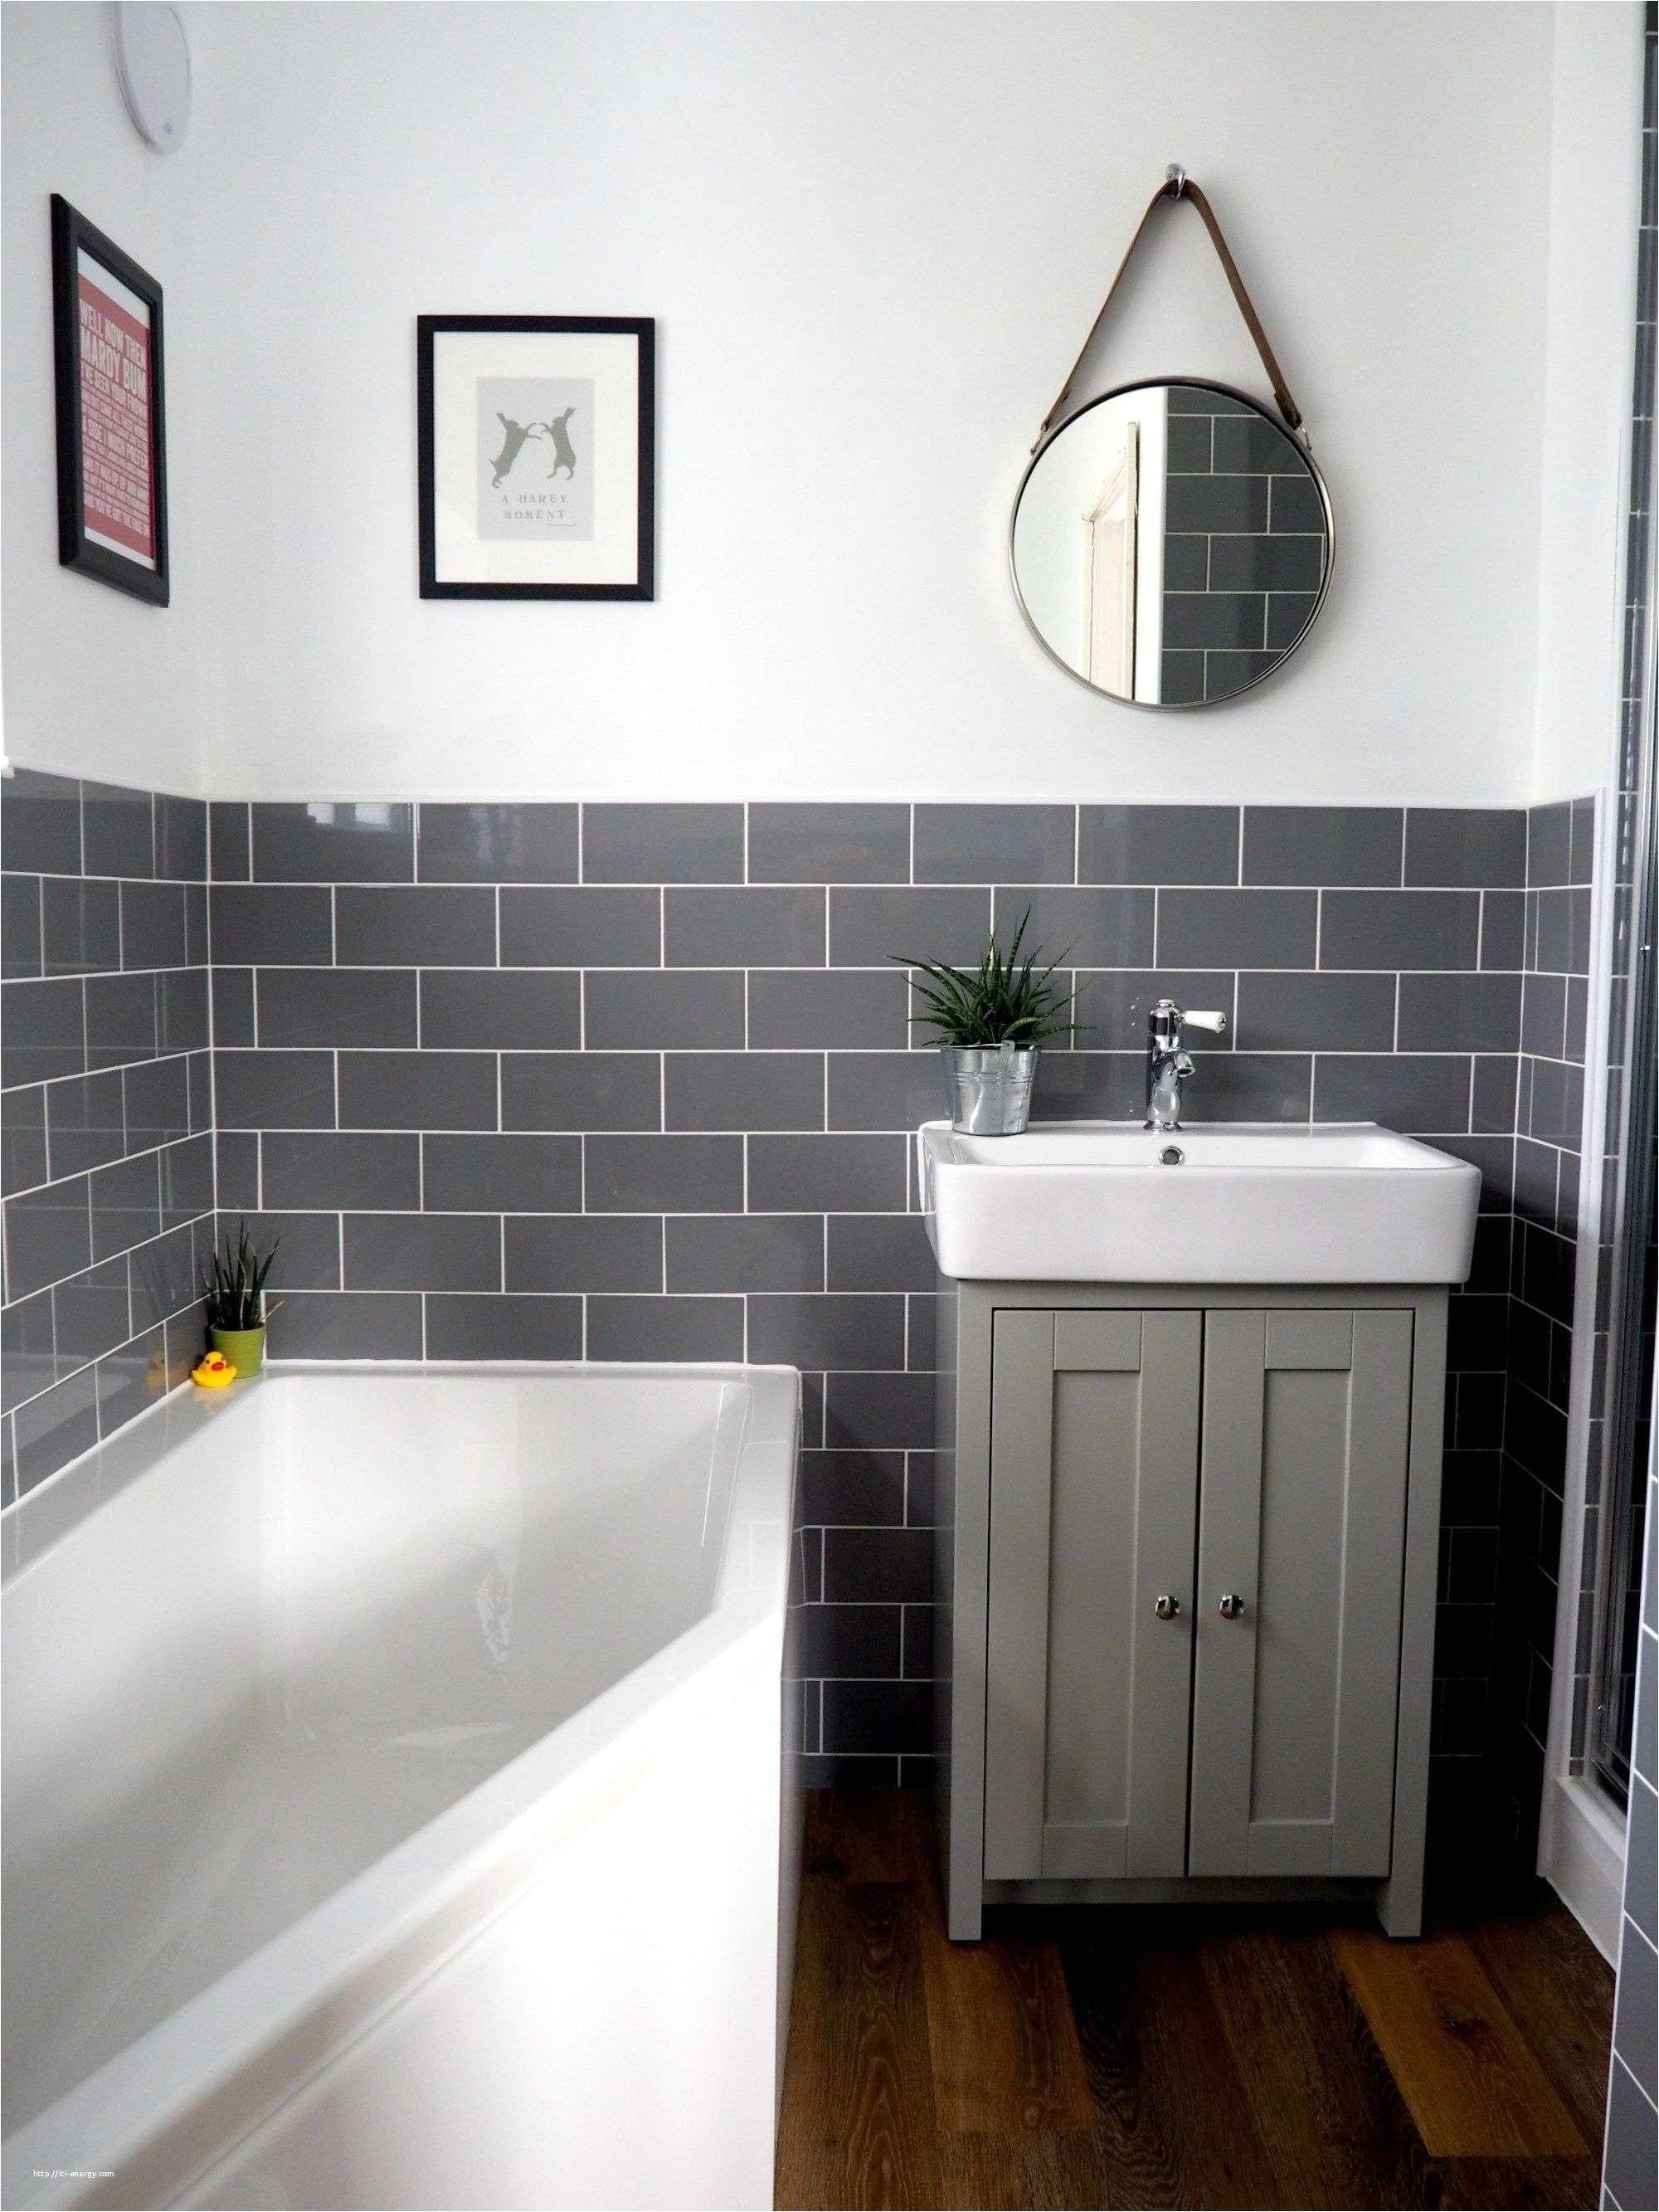 Best Subway Tile Designs Bathroom More Image Ideas